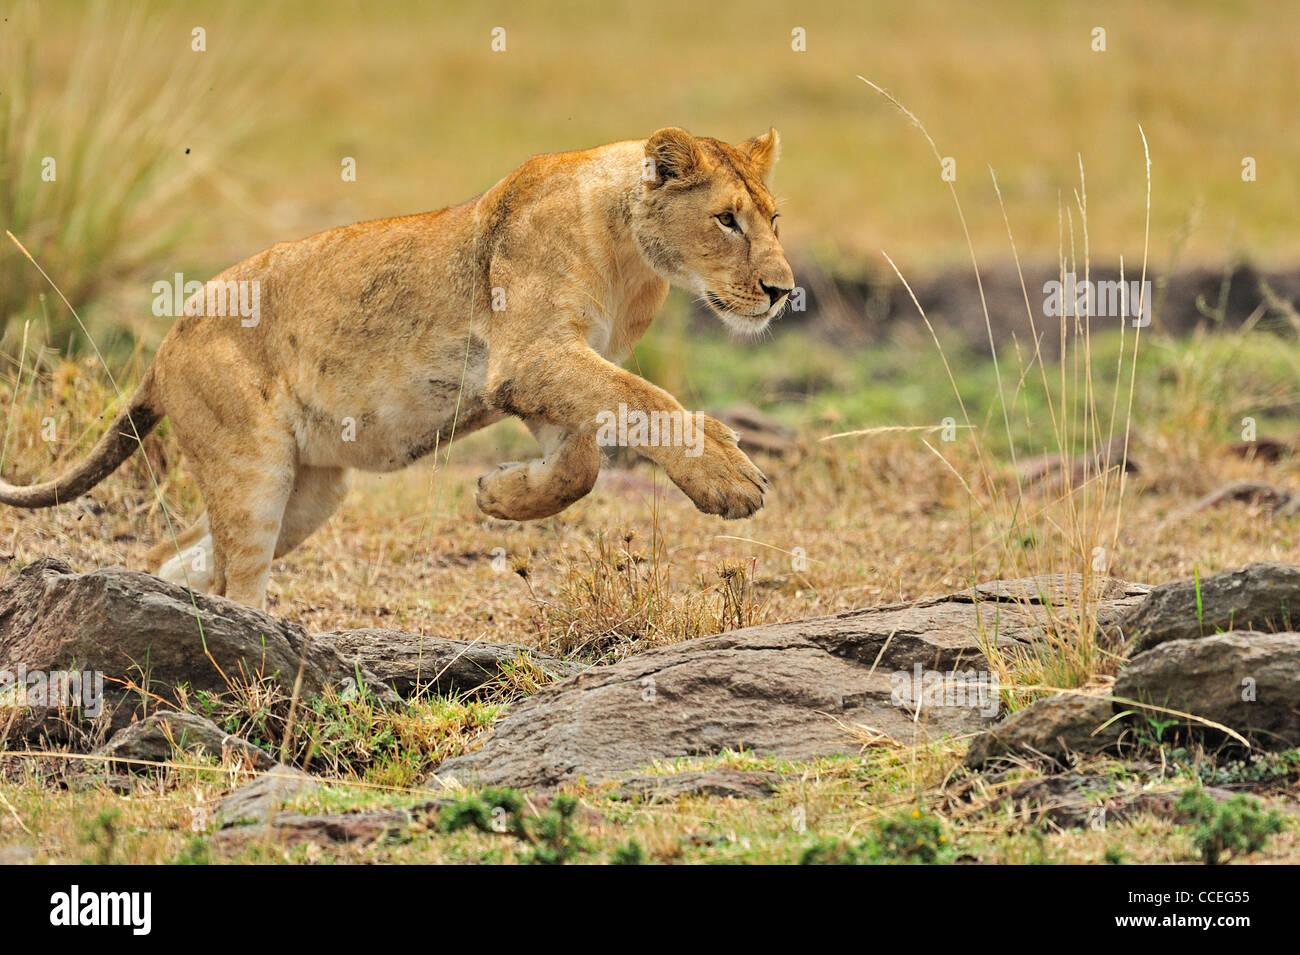 A charging lioness in Masai Mara, Kenya, Africa - Stock Image